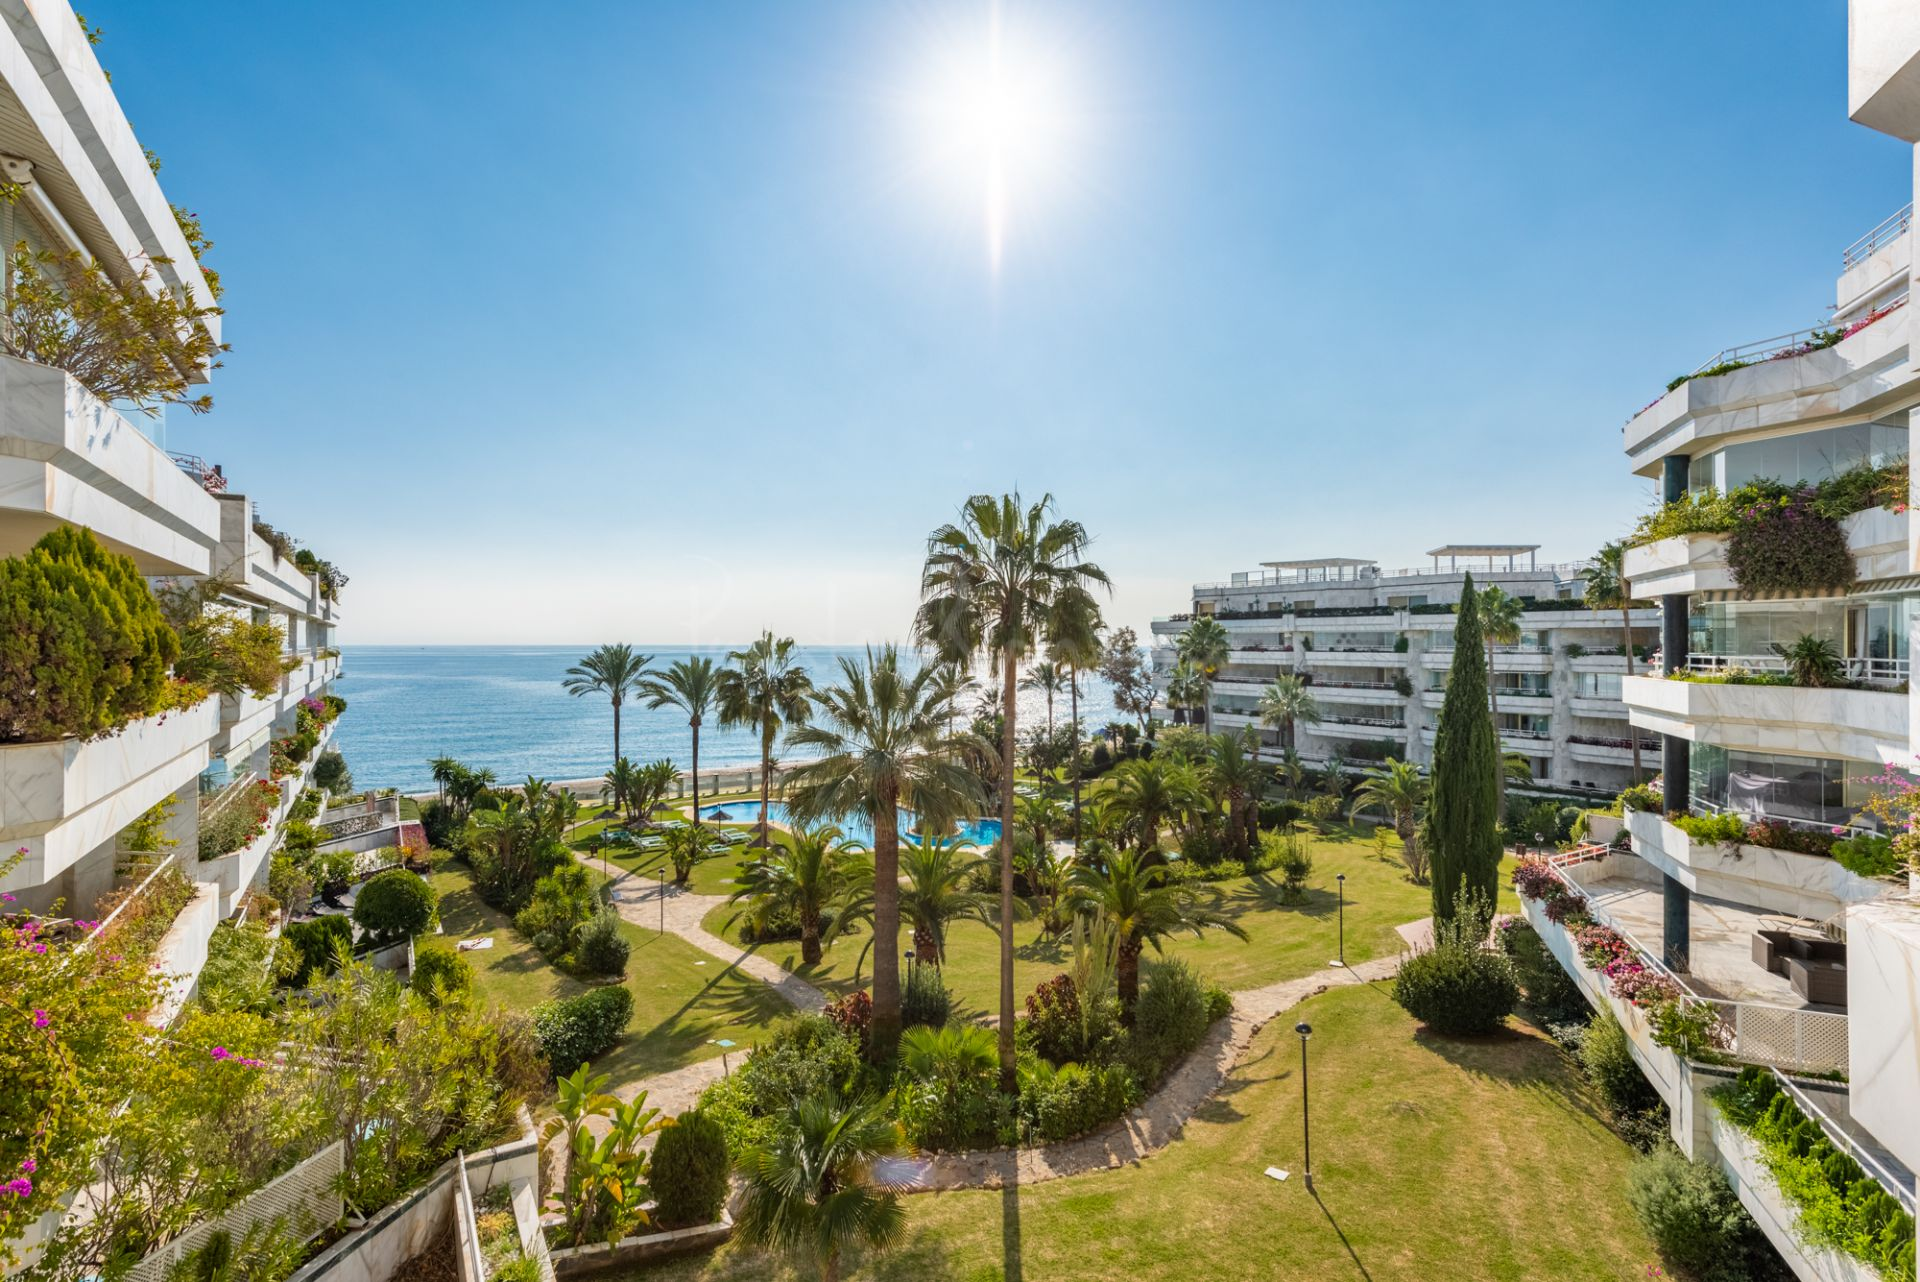 Apartment in Playa Esmeralda, Marbella